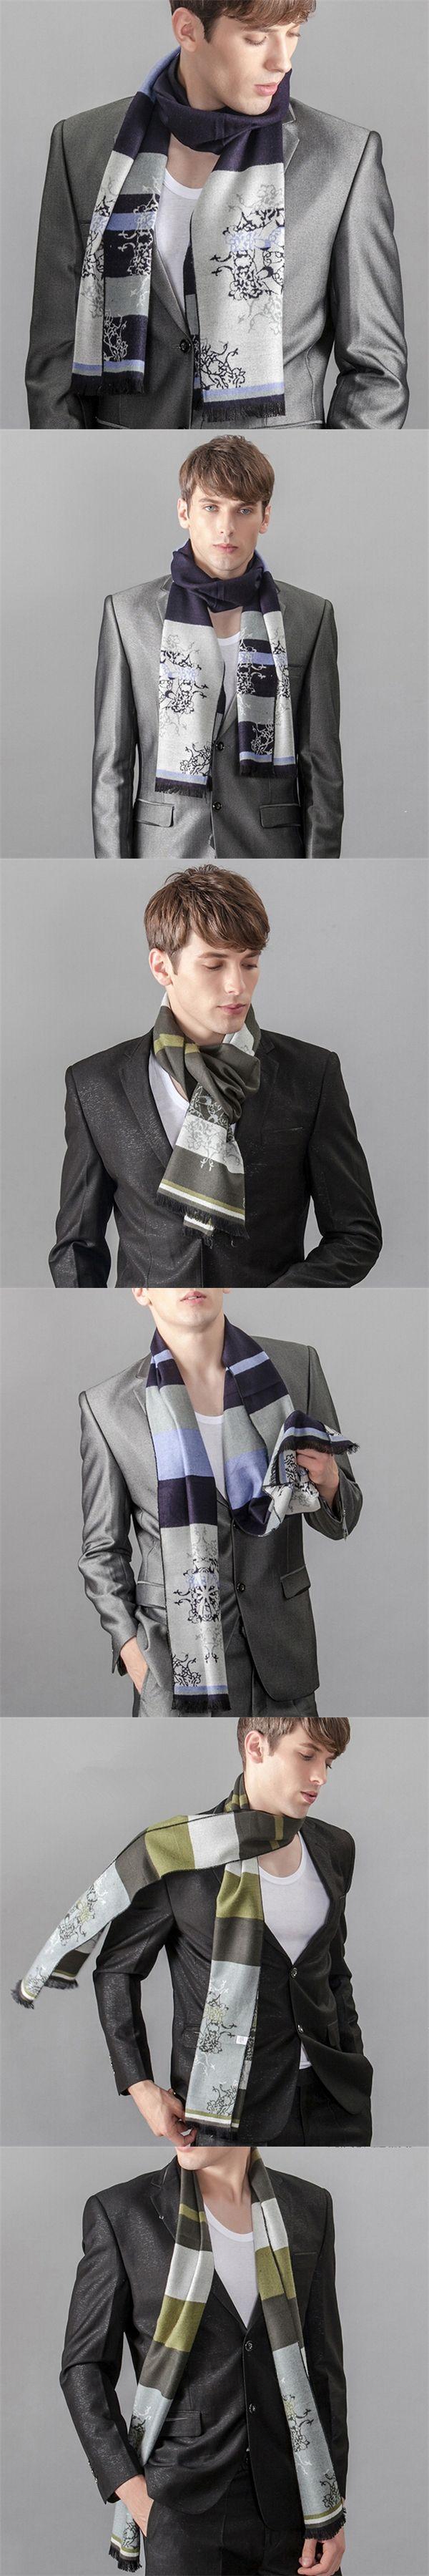 Luxury Brand Scarf Men Winter Warm Shawls Men's cashmere Scarf Hiver Stripe Scarves Echarpe Wool Scarfs Casual Man  JD10075